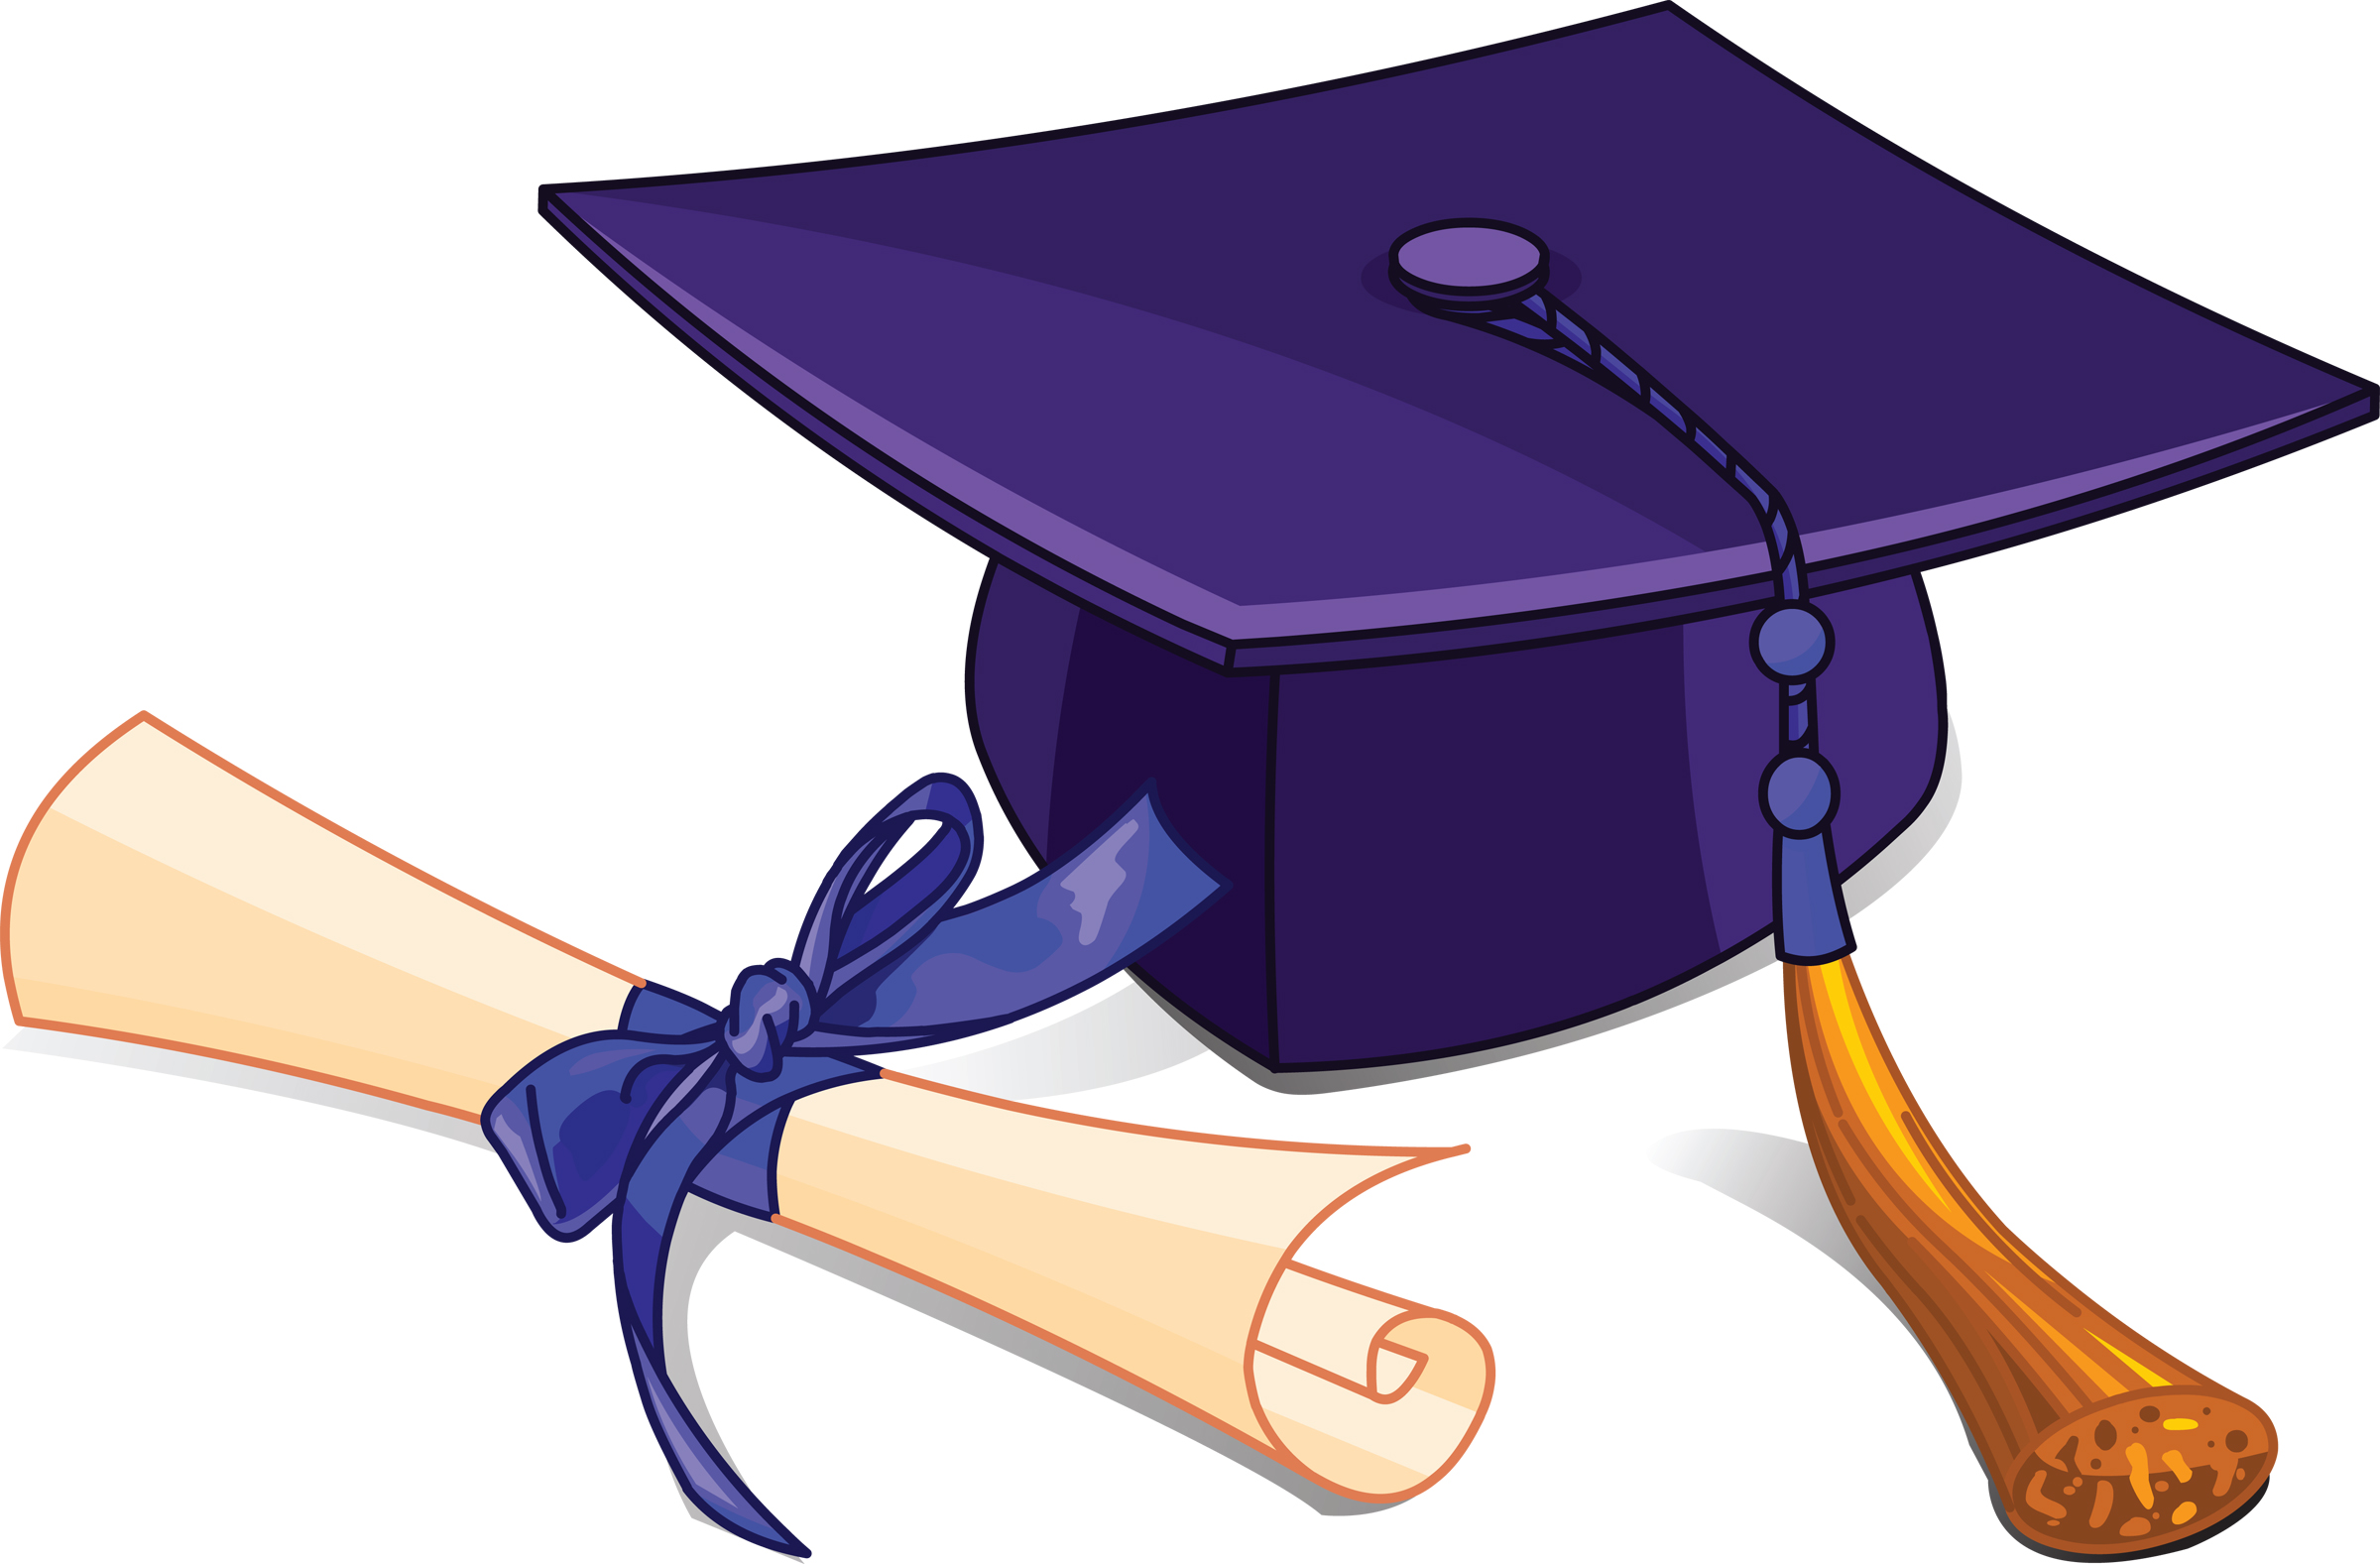 Gown Clipart; High School . Graduation C-Gown Clipart; High School . Graduation Cap and Diploma .-8